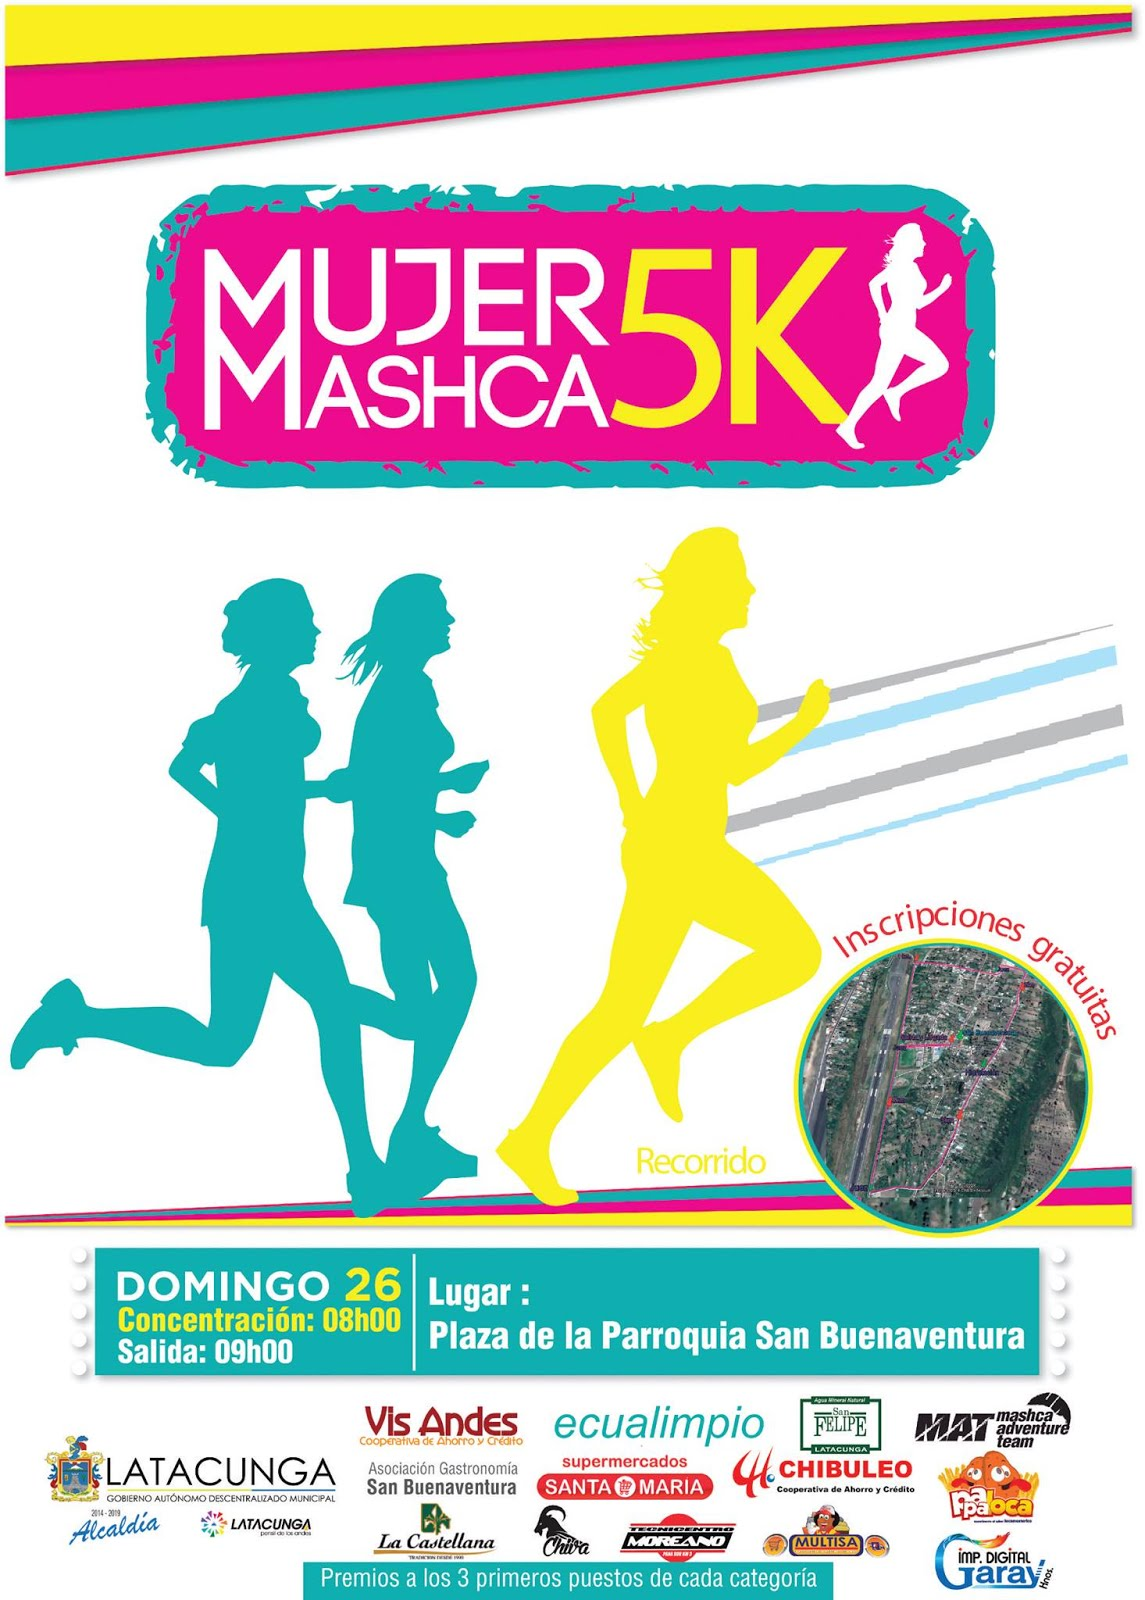 MUJER MASHCA 5K 2017